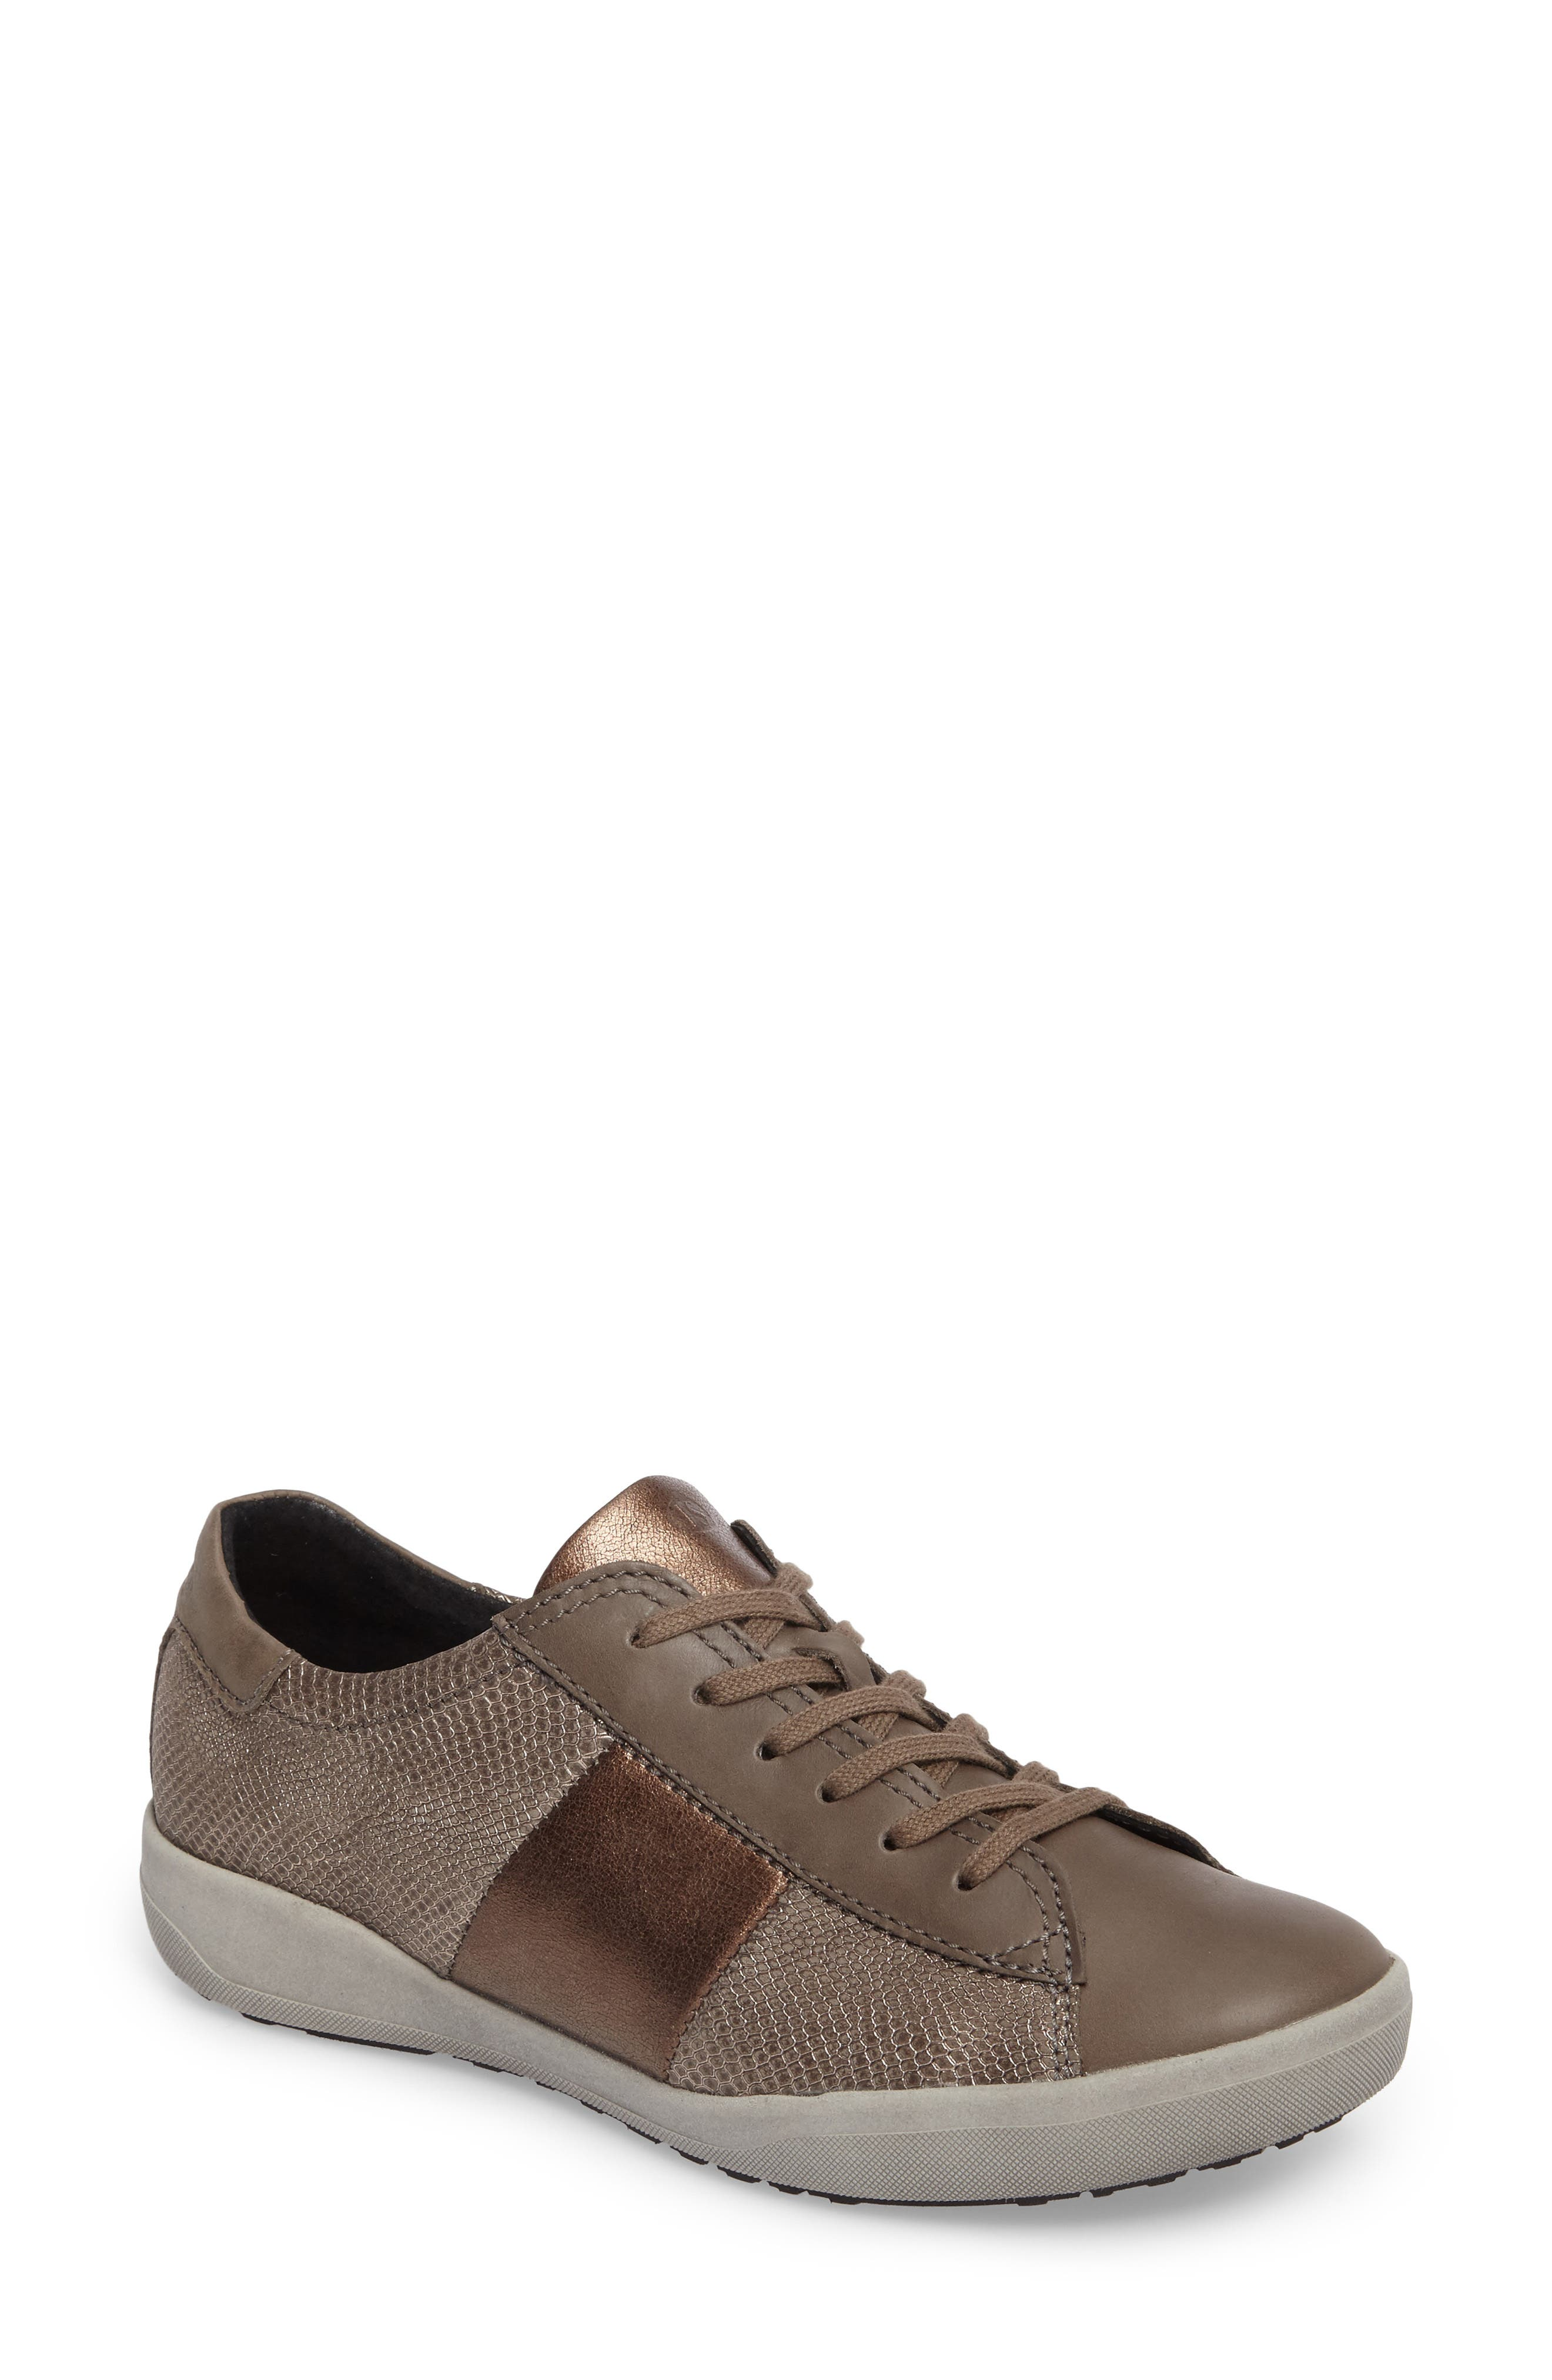 Sina 27 Sneaker,                             Main thumbnail 1, color,                             Asphalt/ Kombi Leather